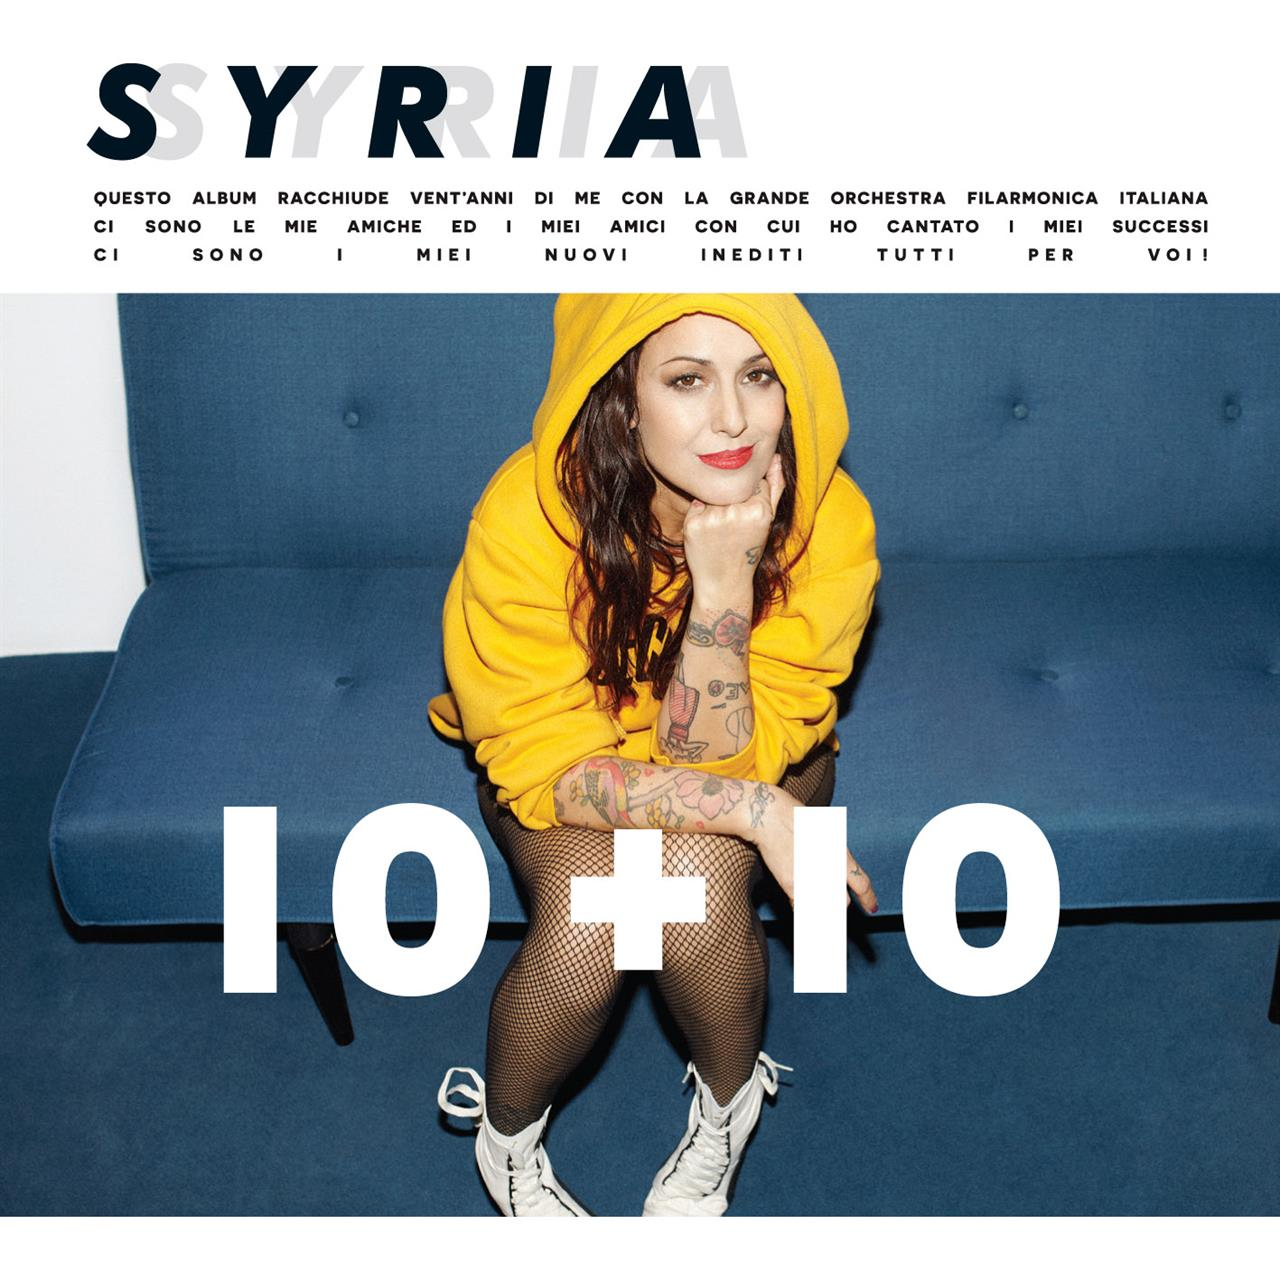 [10's] Syria - Lontana Da Te (2017) Syria%20-%2010%20%2B%2010